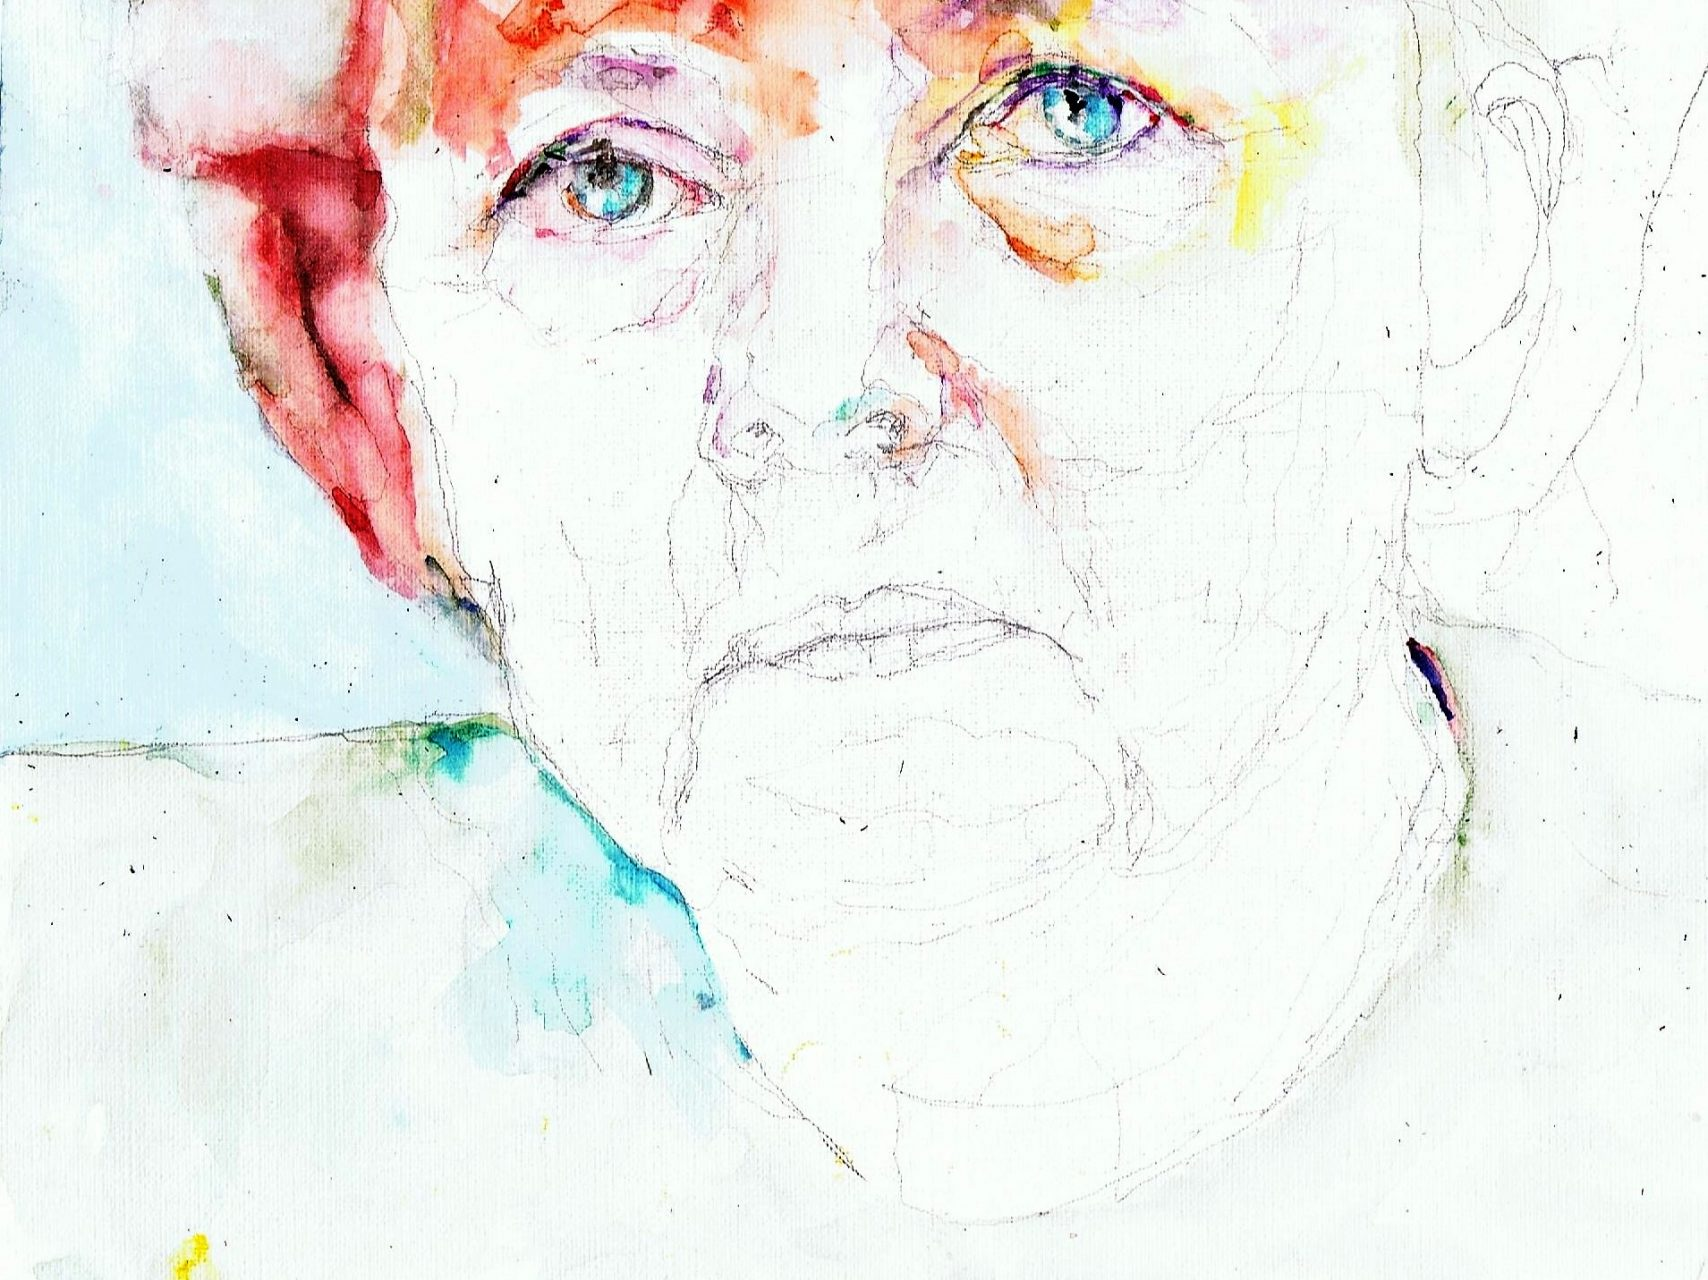 365 dagen een portret 68 Angela Merkel, premier Duitsland Aquarel 19c25